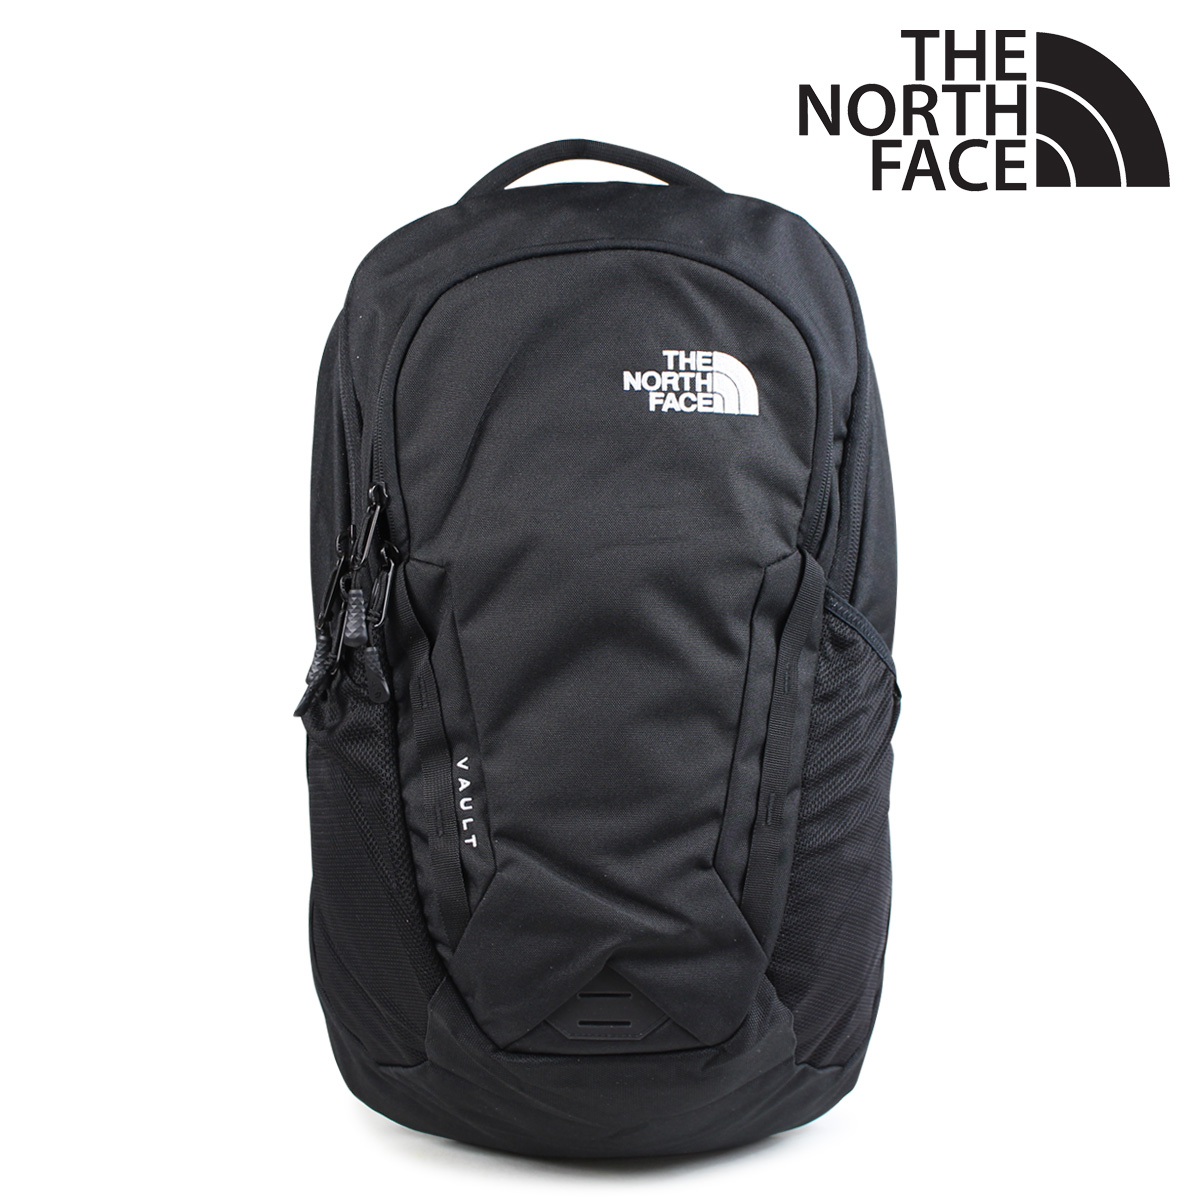 THE NORTH FACE ノースフェイス リュック メンズ バックパック VAULT T93KV9JK3 ブラック [予約商品 4/10頃入荷予定 再入荷]